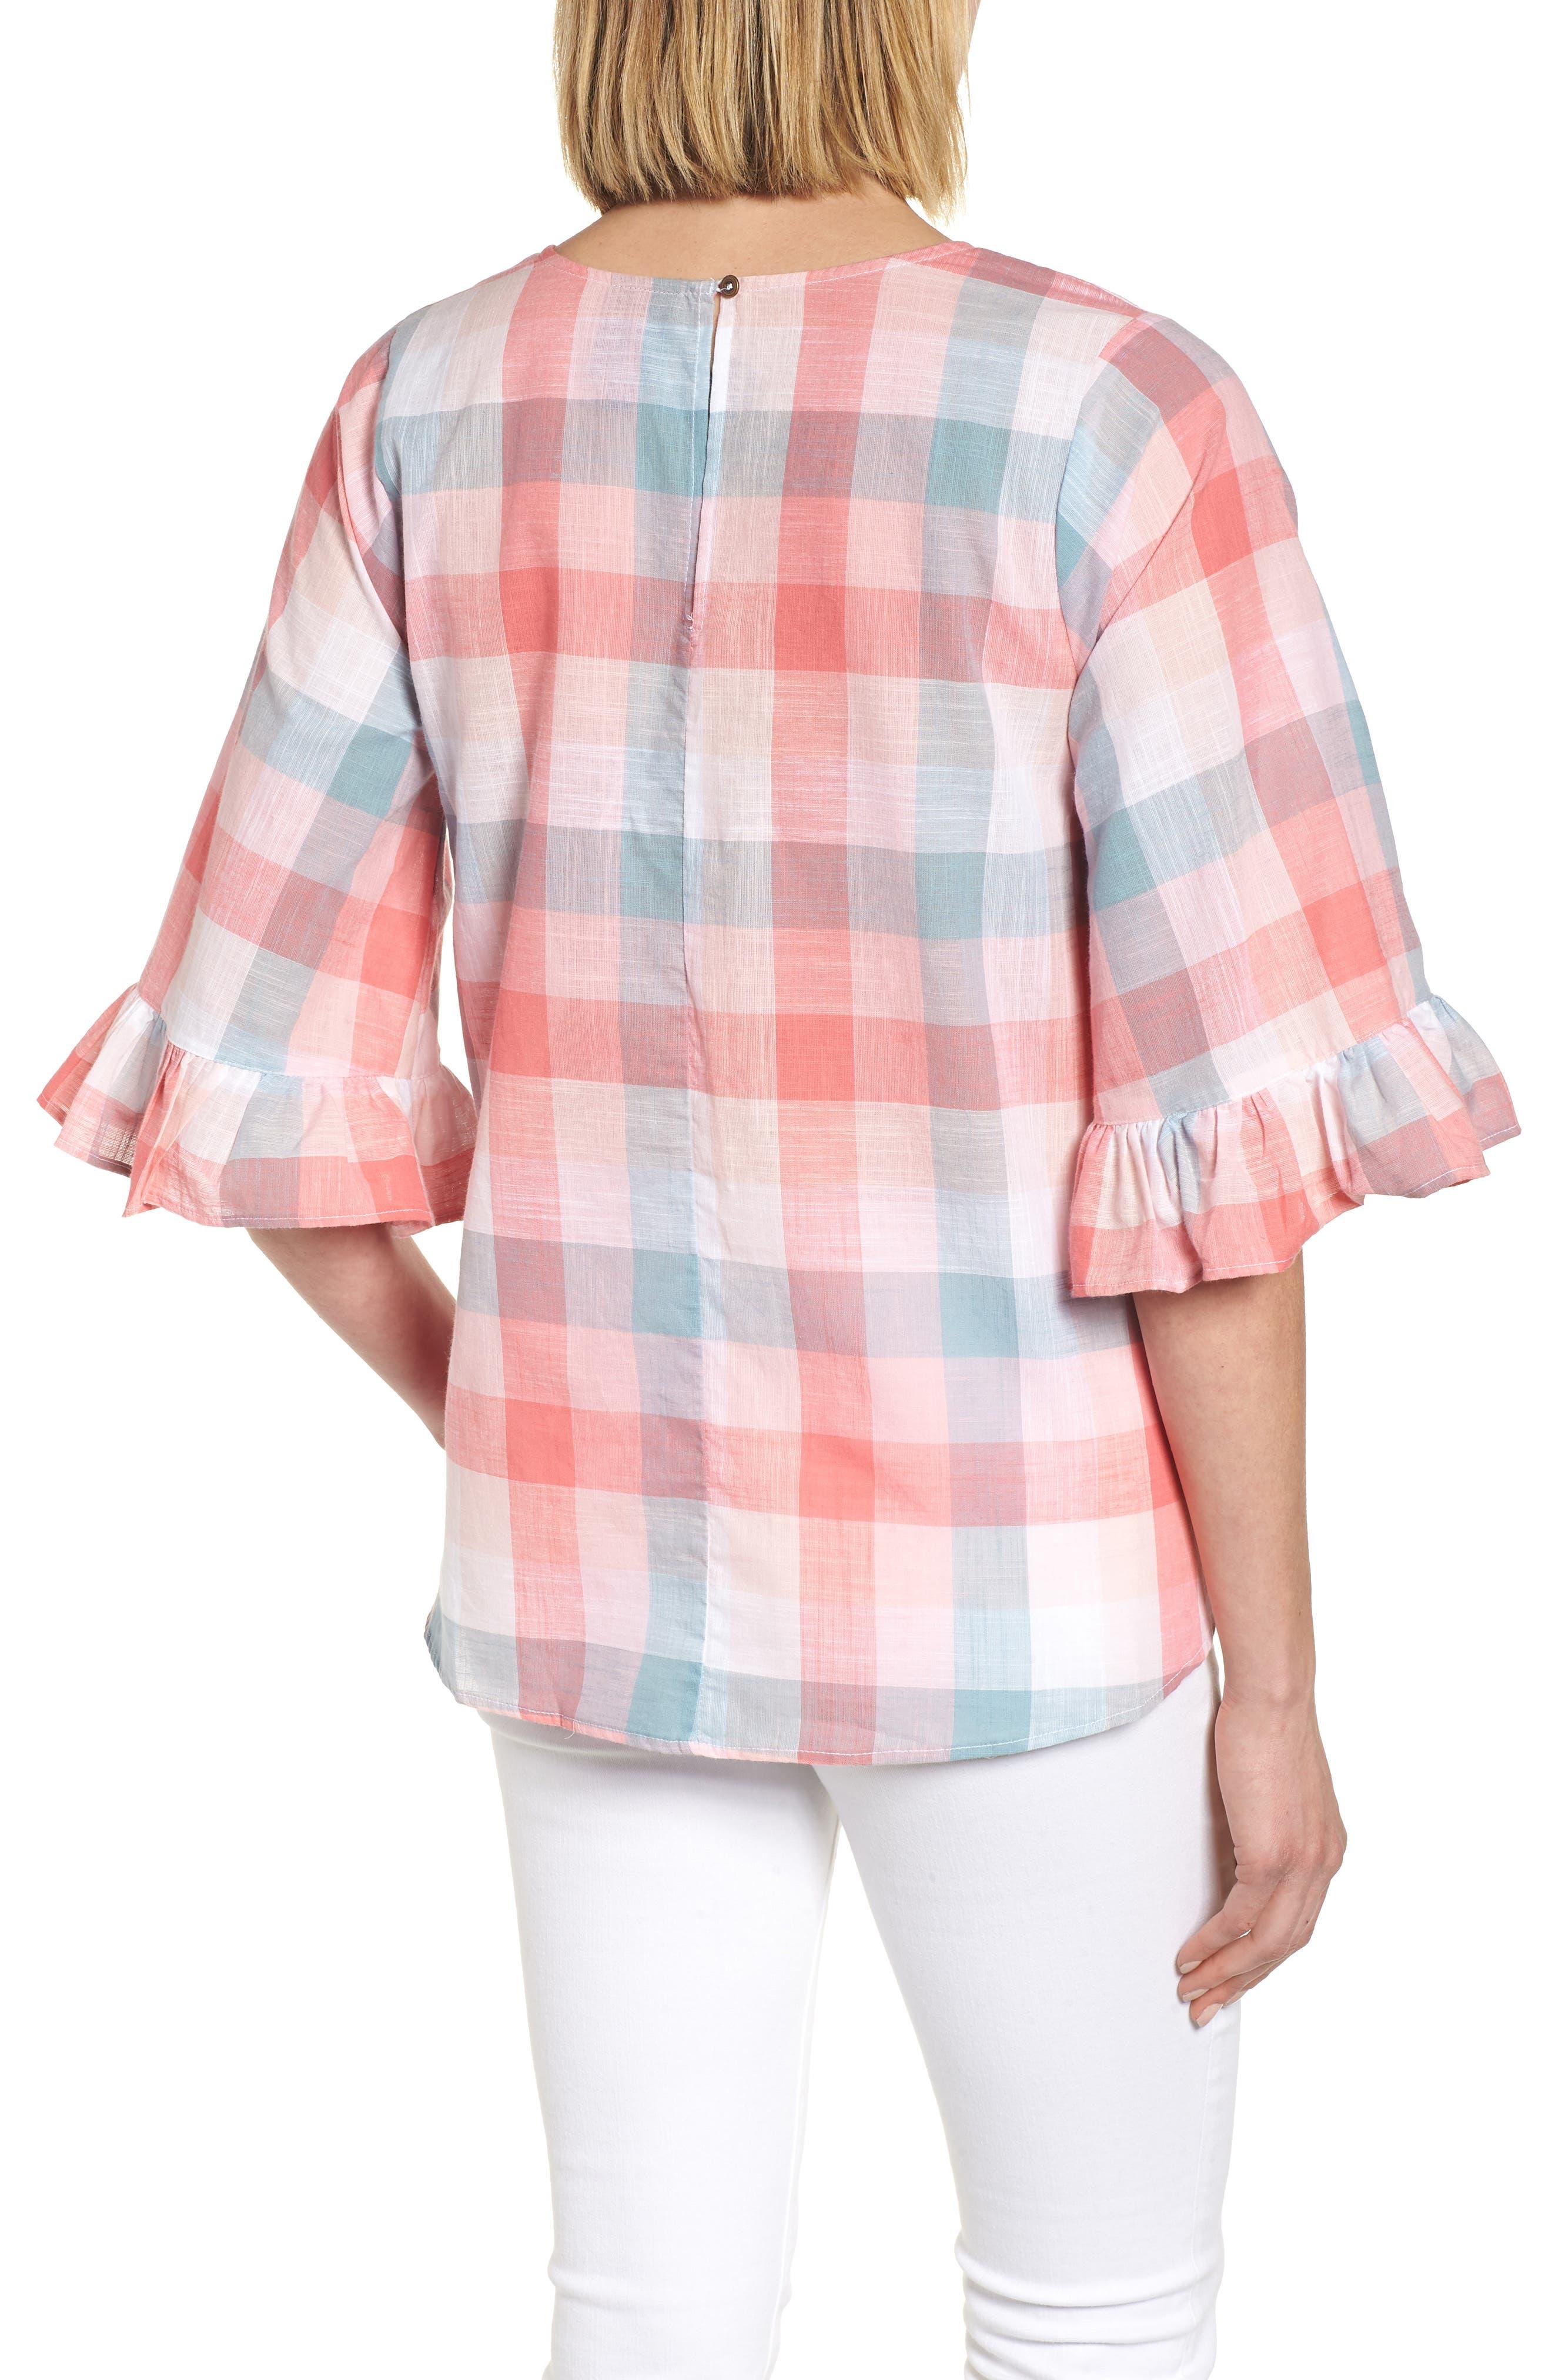 Pastel Plaid Ruffle Sleeve Cotton Top,                             Alternate thumbnail 2, color,                             Pink Plaid